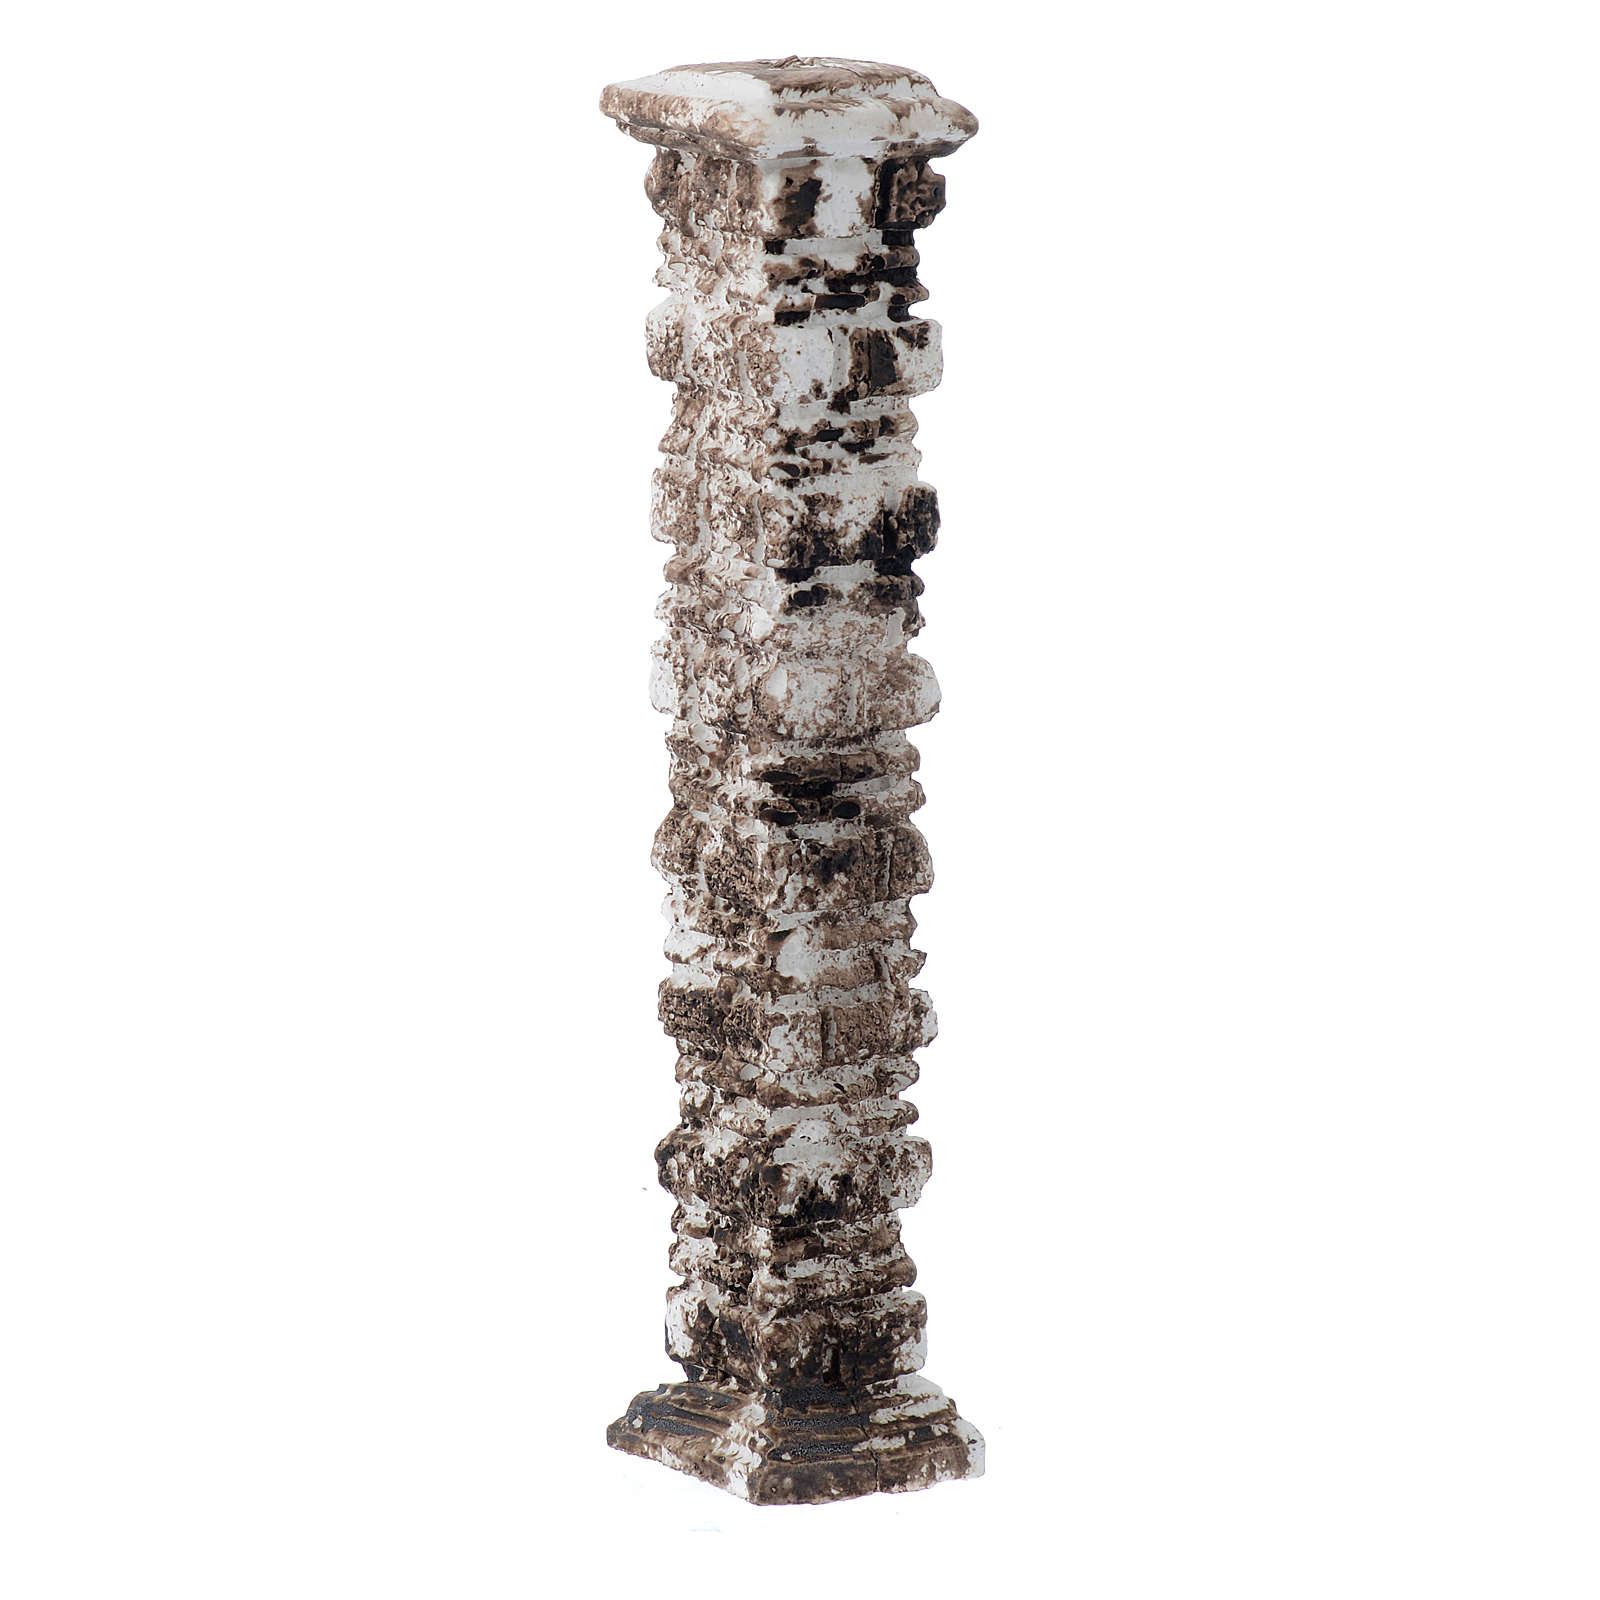 Resin column with ancient stones 15x5x5 cm 4